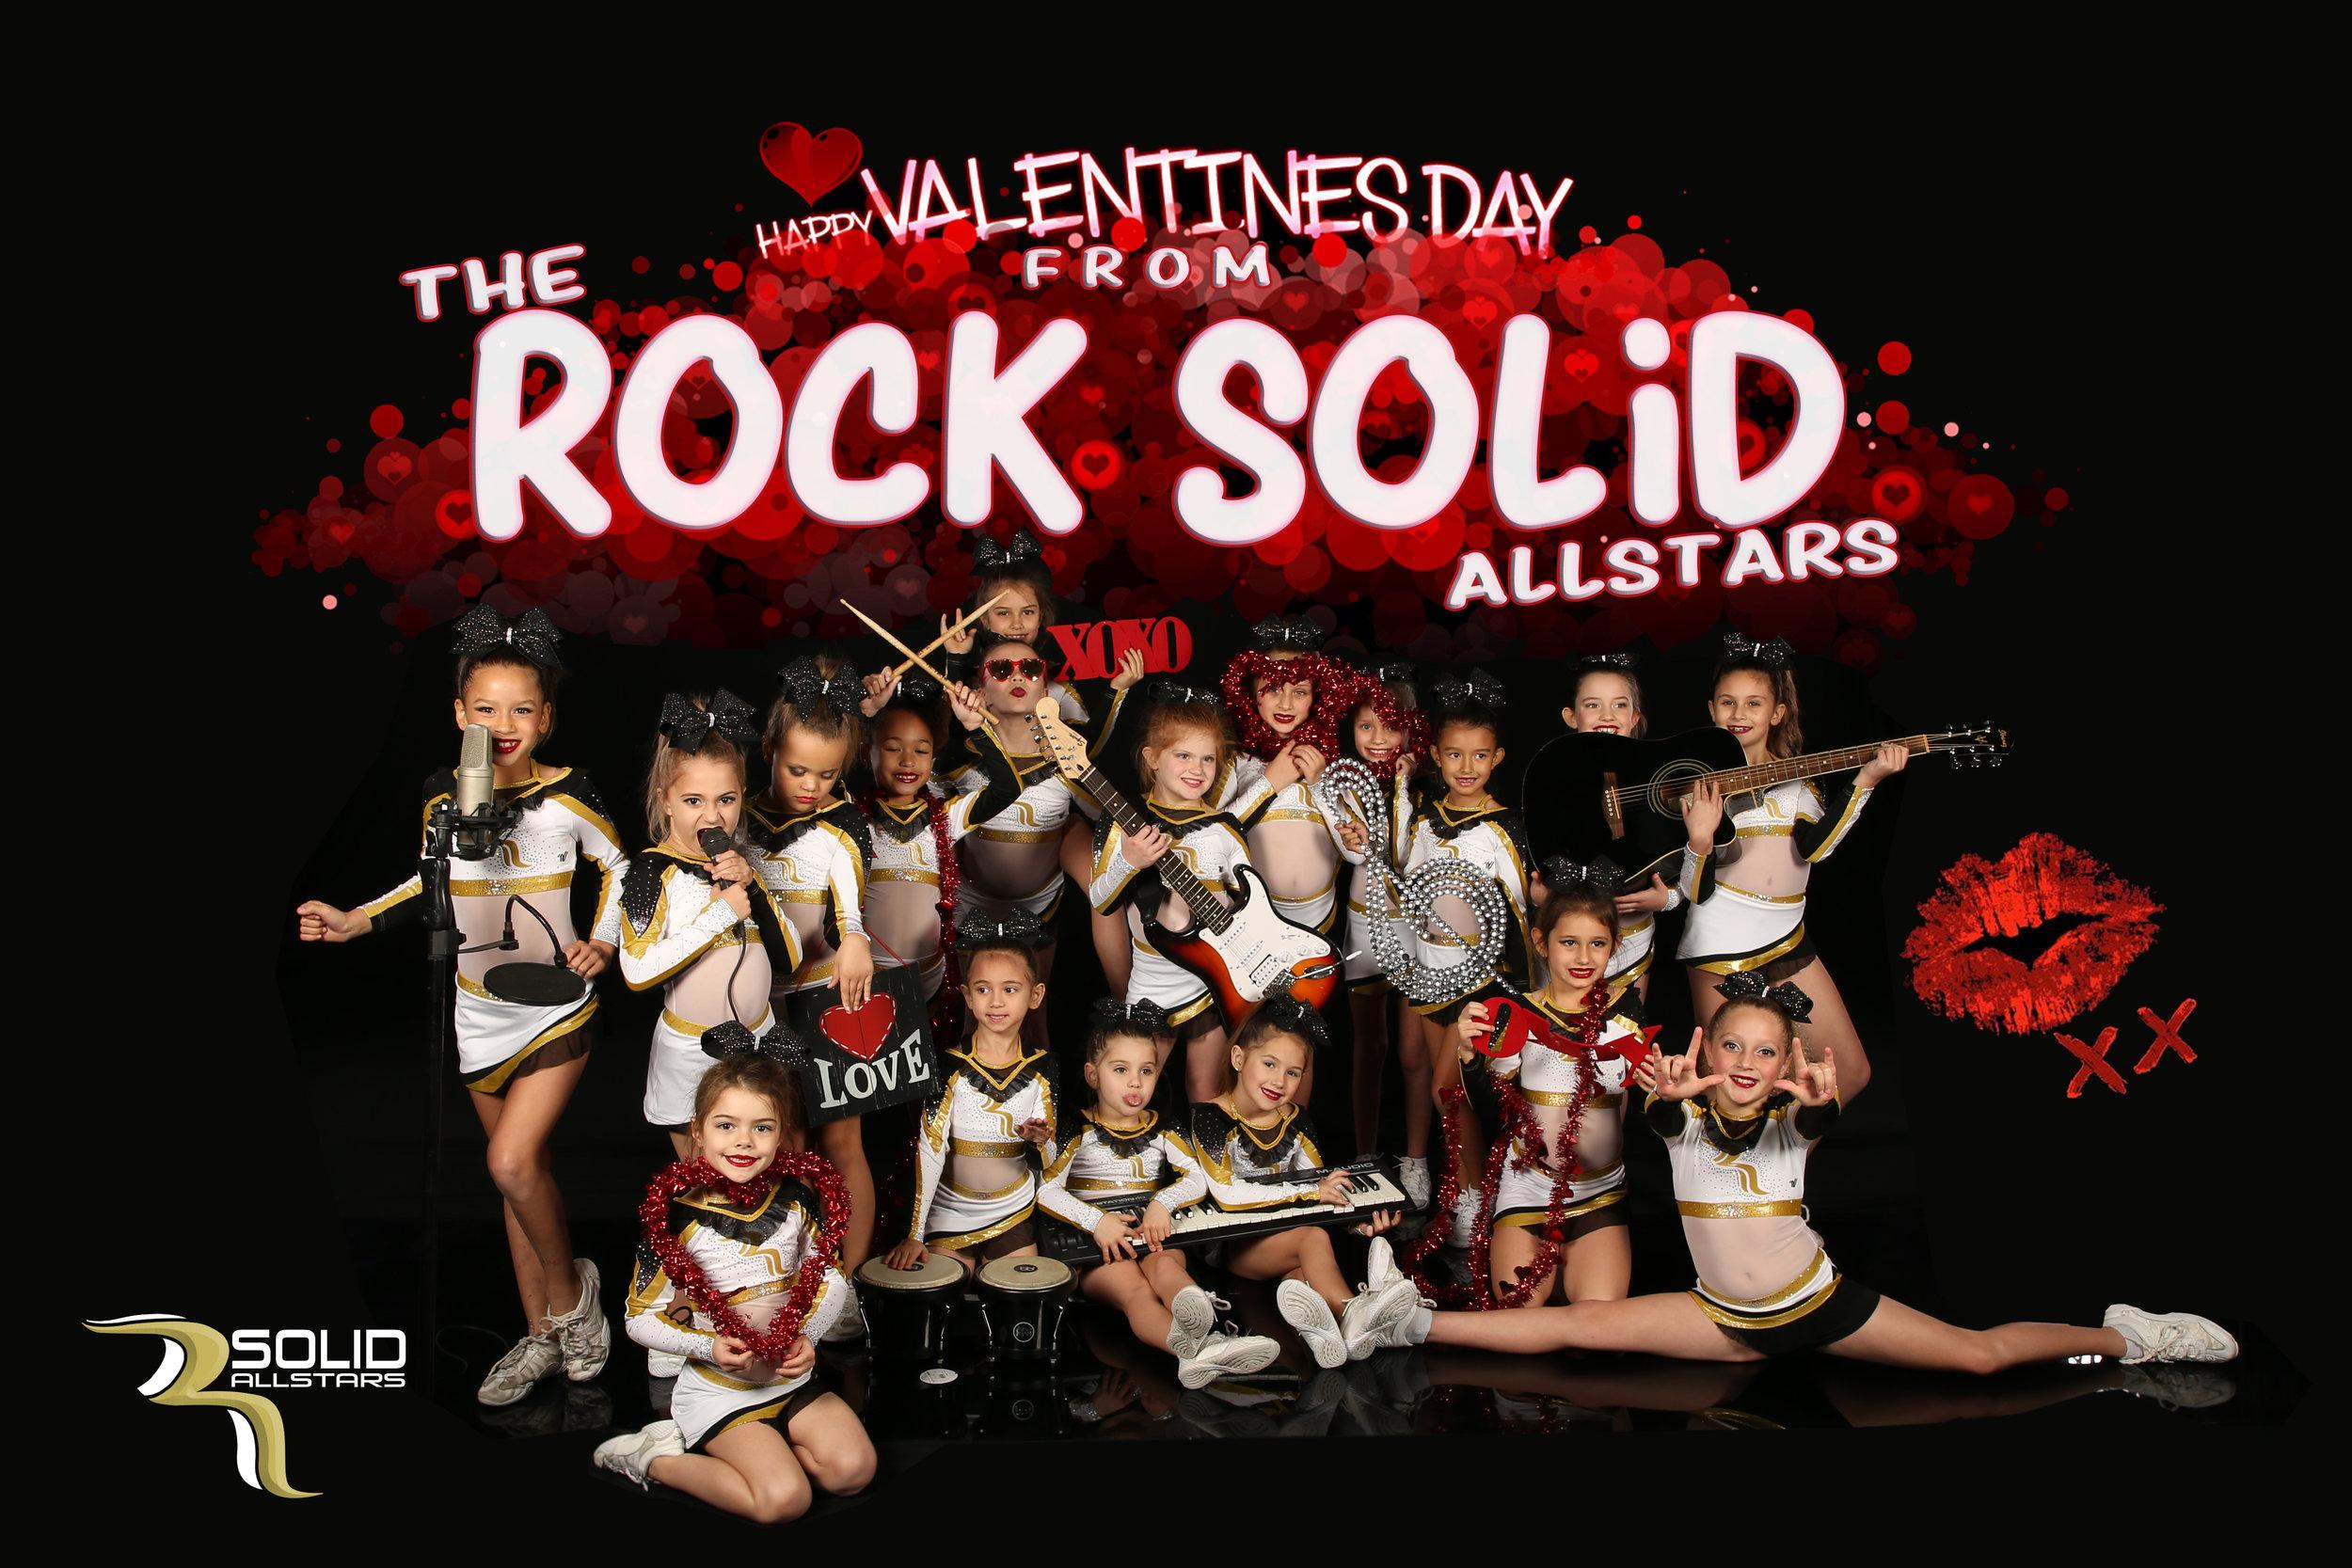 Rock - 2018 - Valentines Day.jpg